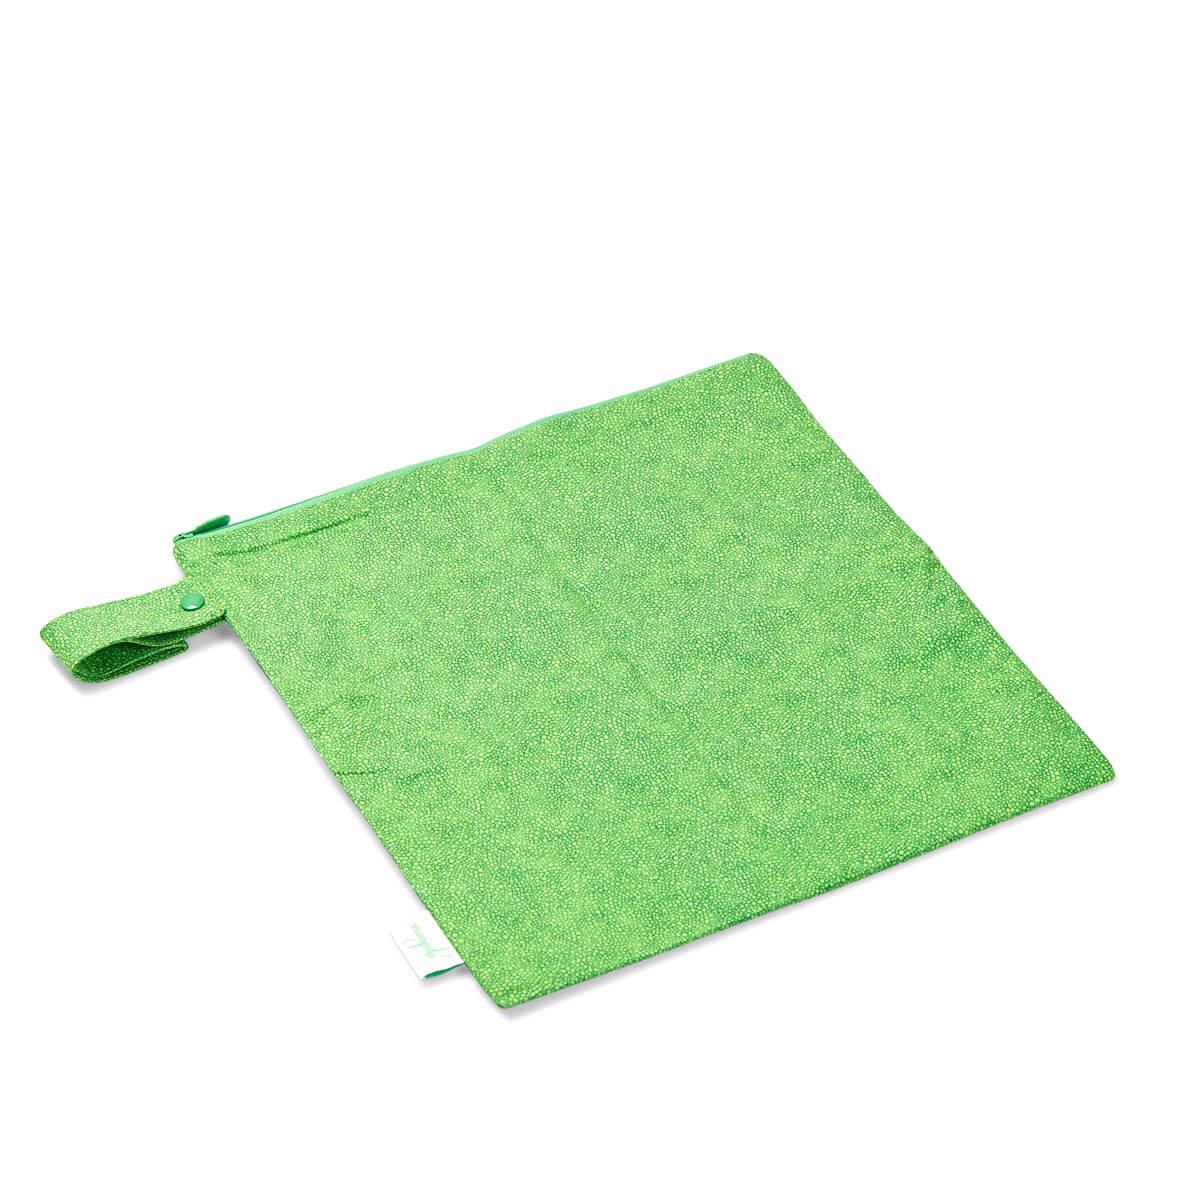 e1300d0eb1 Tote-Bag-Set-Citrus-Swirl-Wet-Garment-Bag